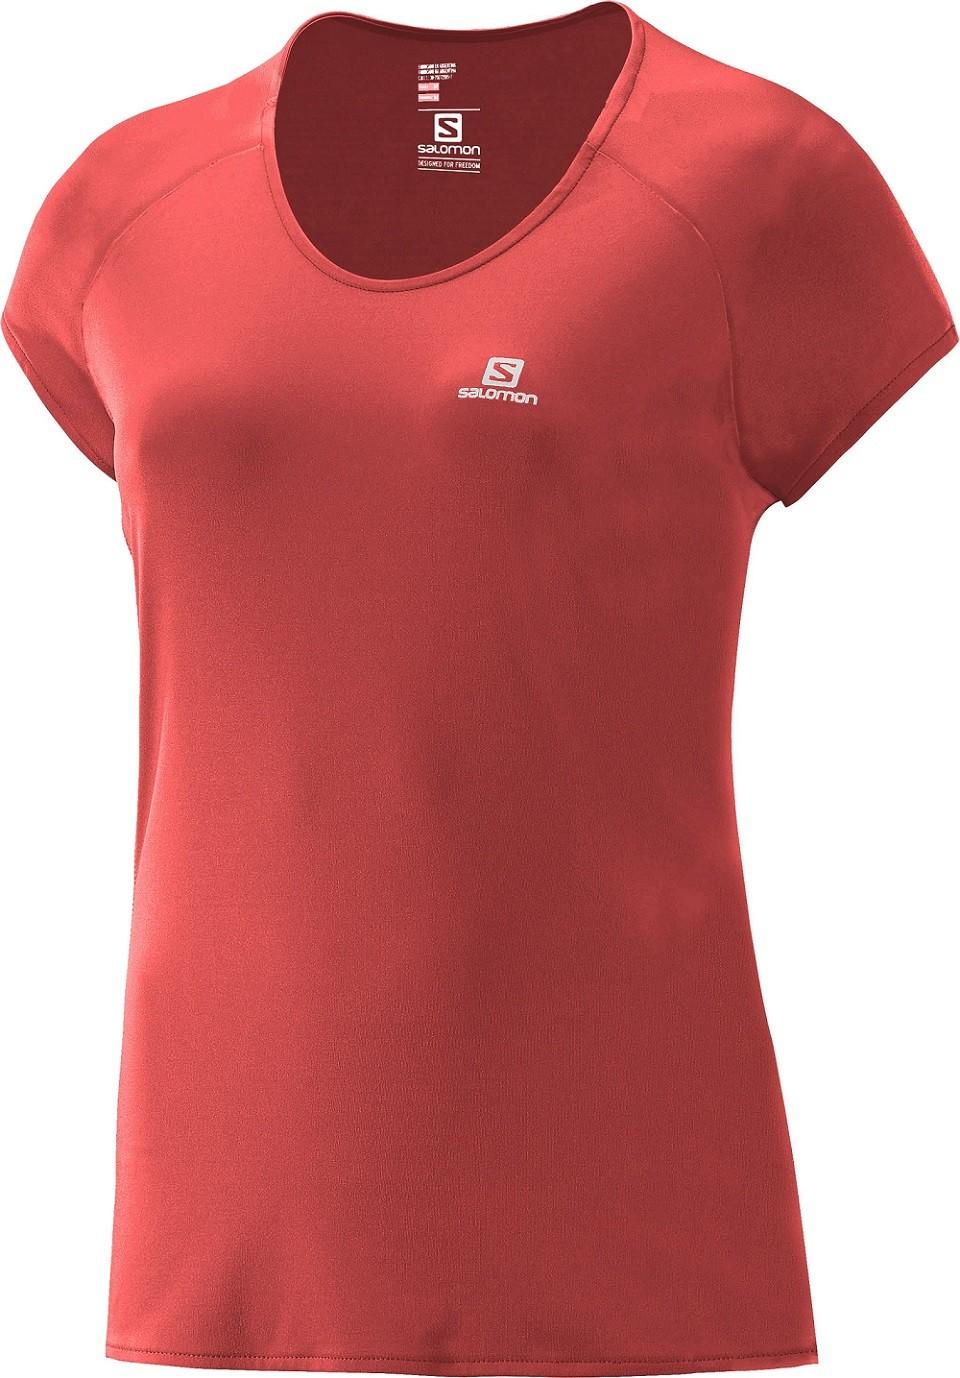 Camiseta Trail Running Thermo SS Feminina Salomon